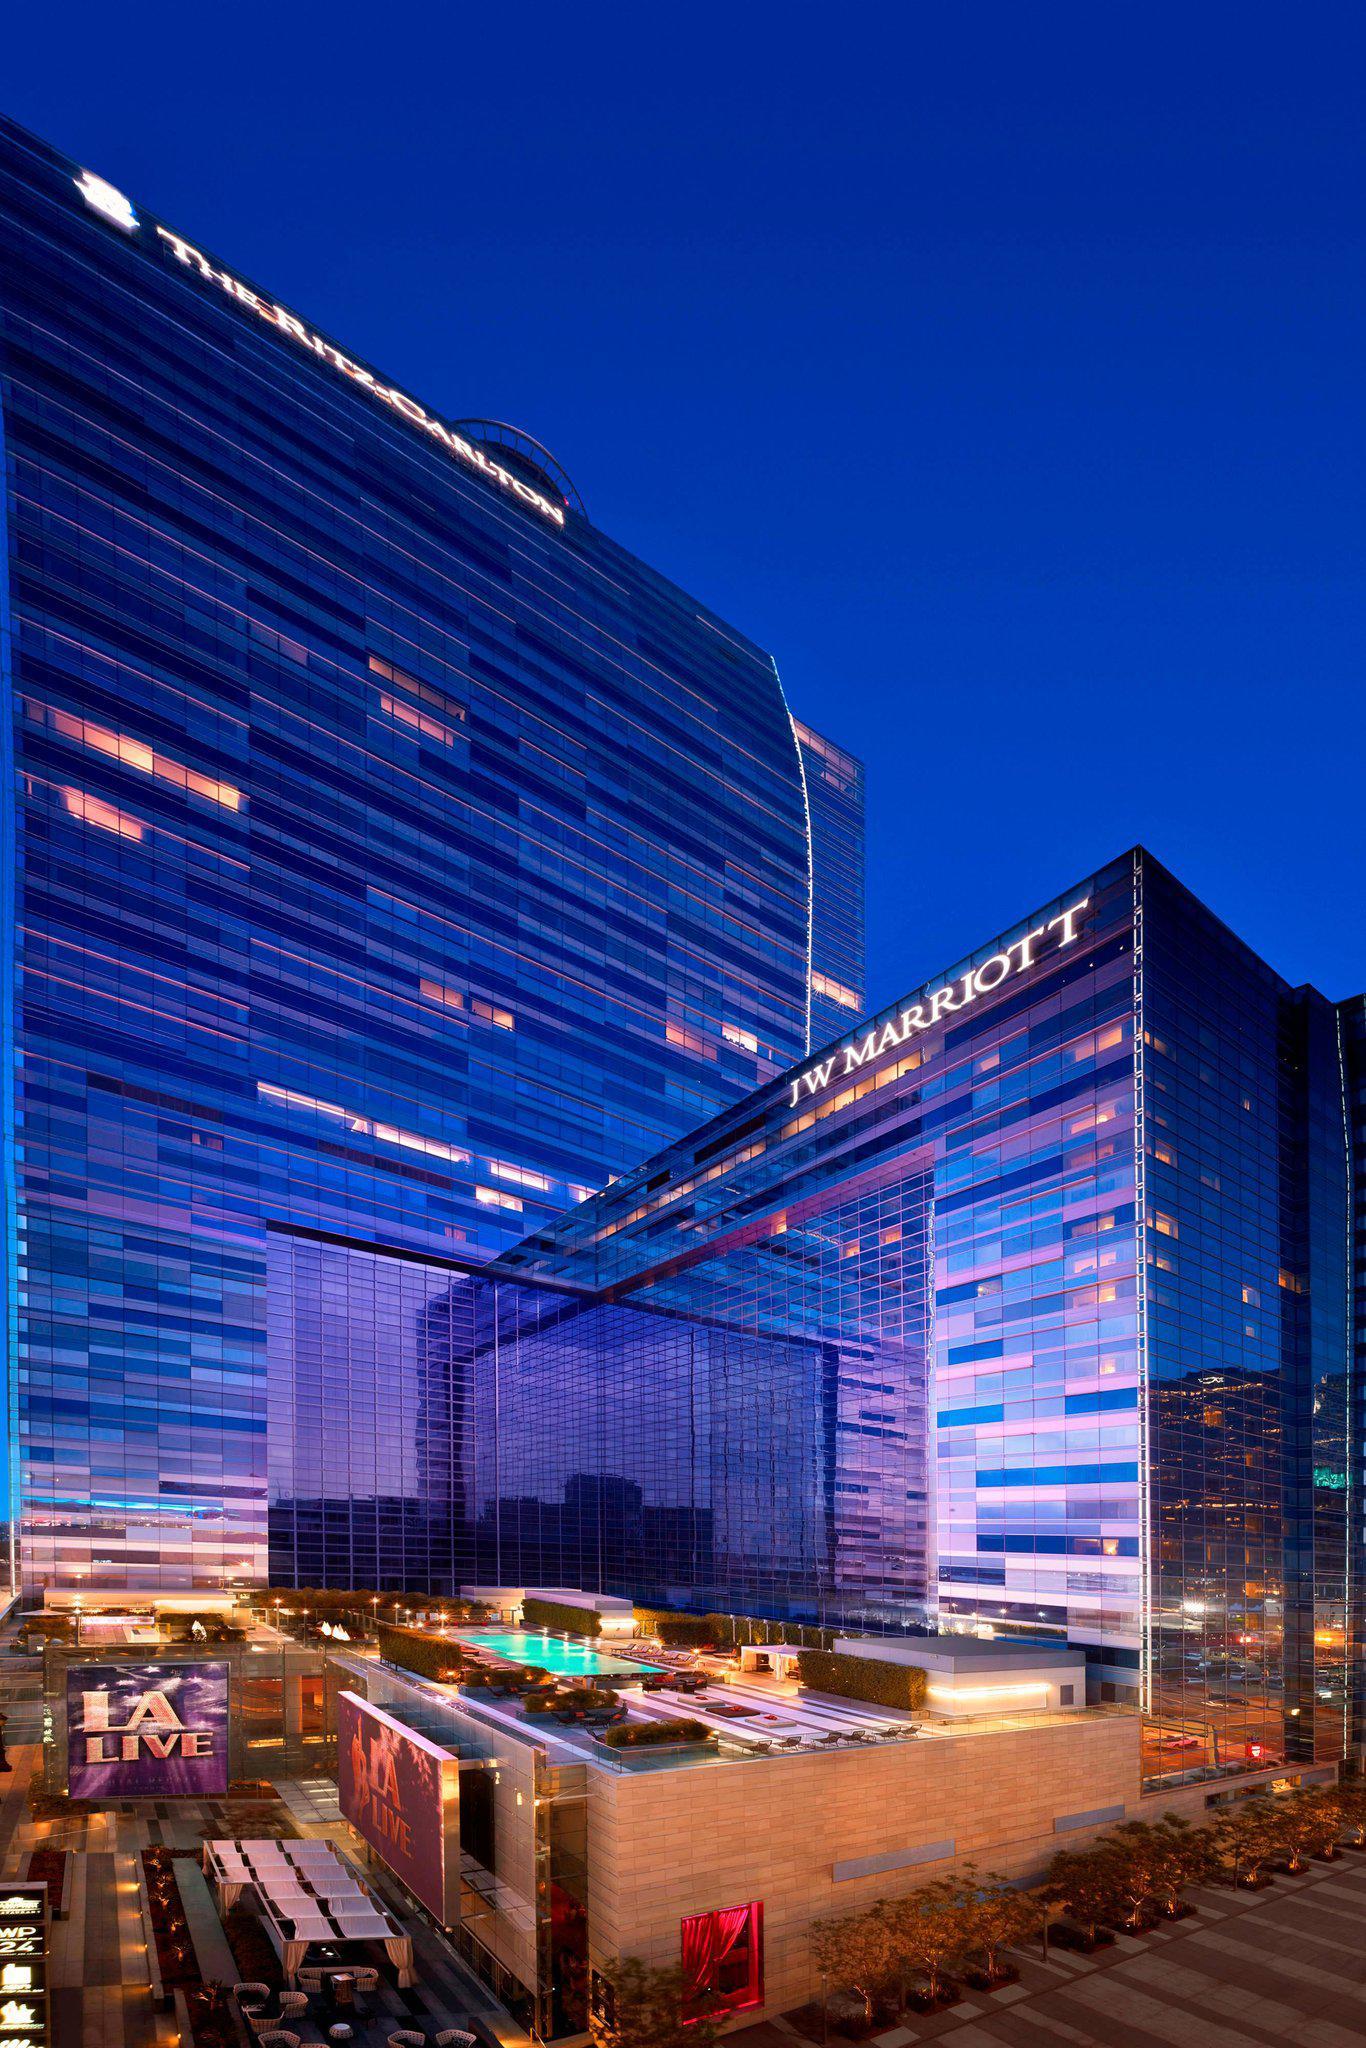 JW Marriott Los Angeles L.A. LIVE